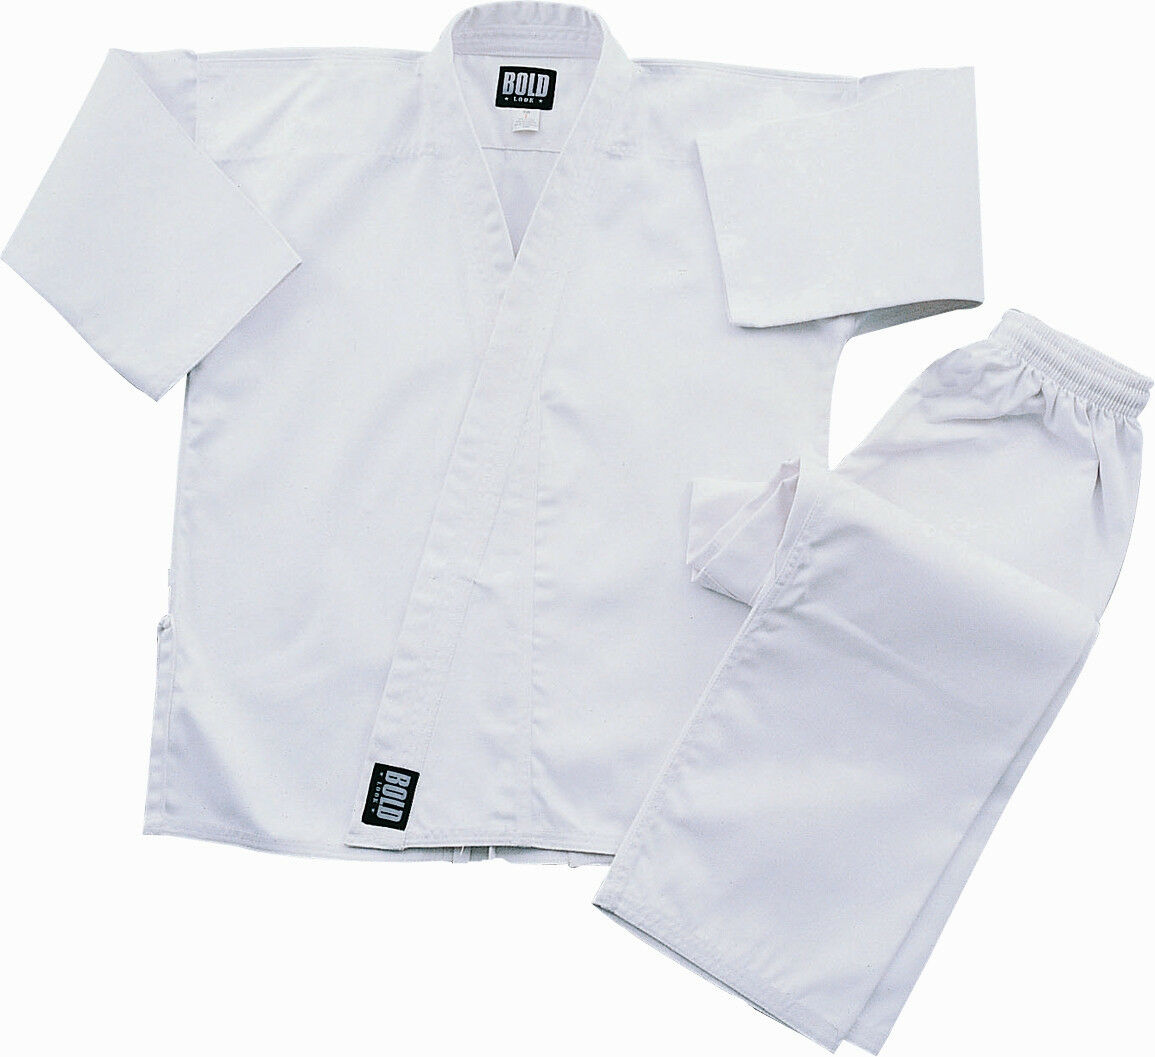 White Heavyweight 12oz Brushed  Cotton Karate Uniform by Bold 550w  buy cheap new